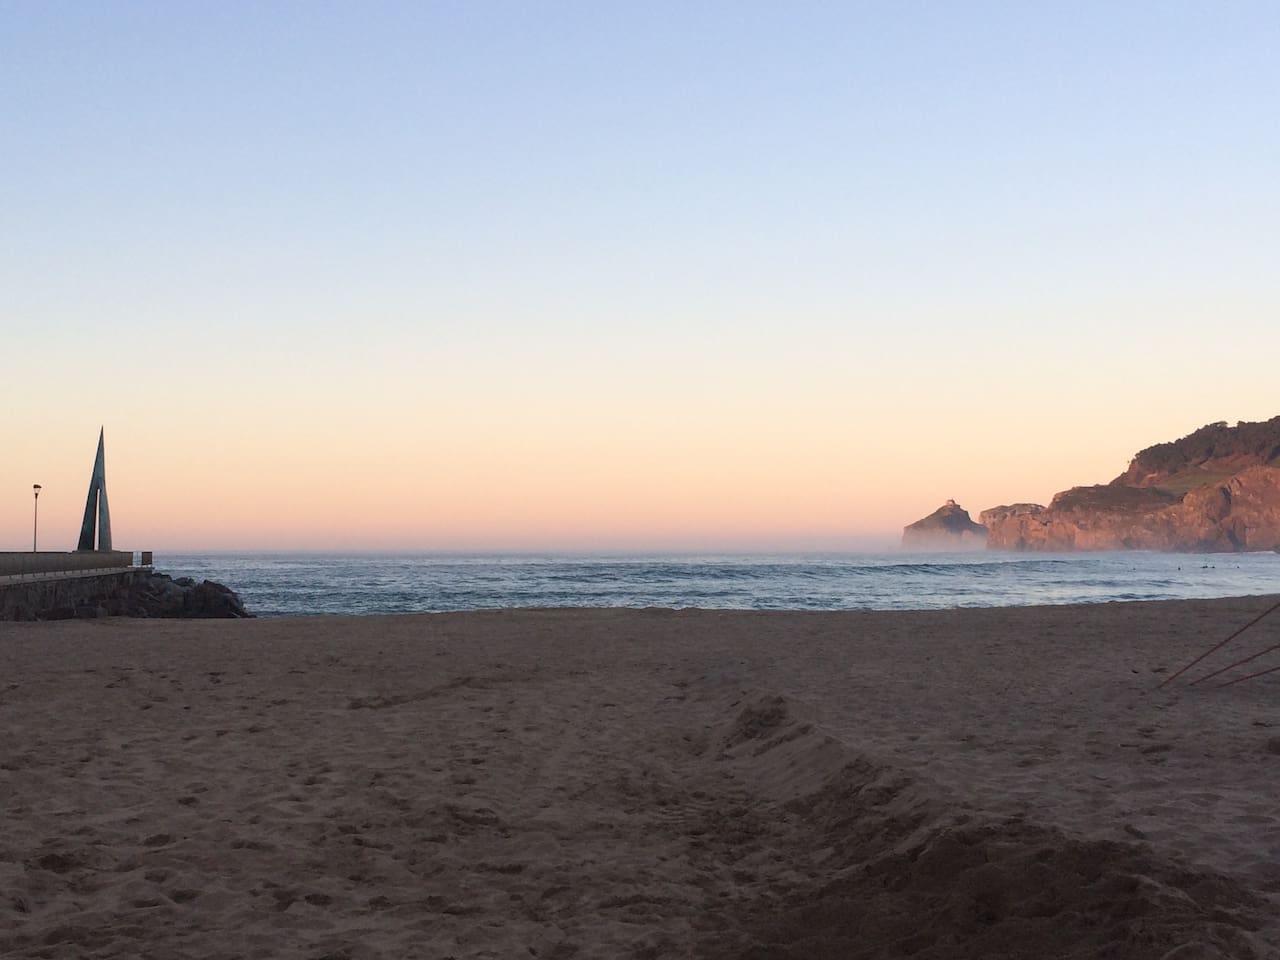 evening view from Bakio beach to San Juan de Gaztelugatxe